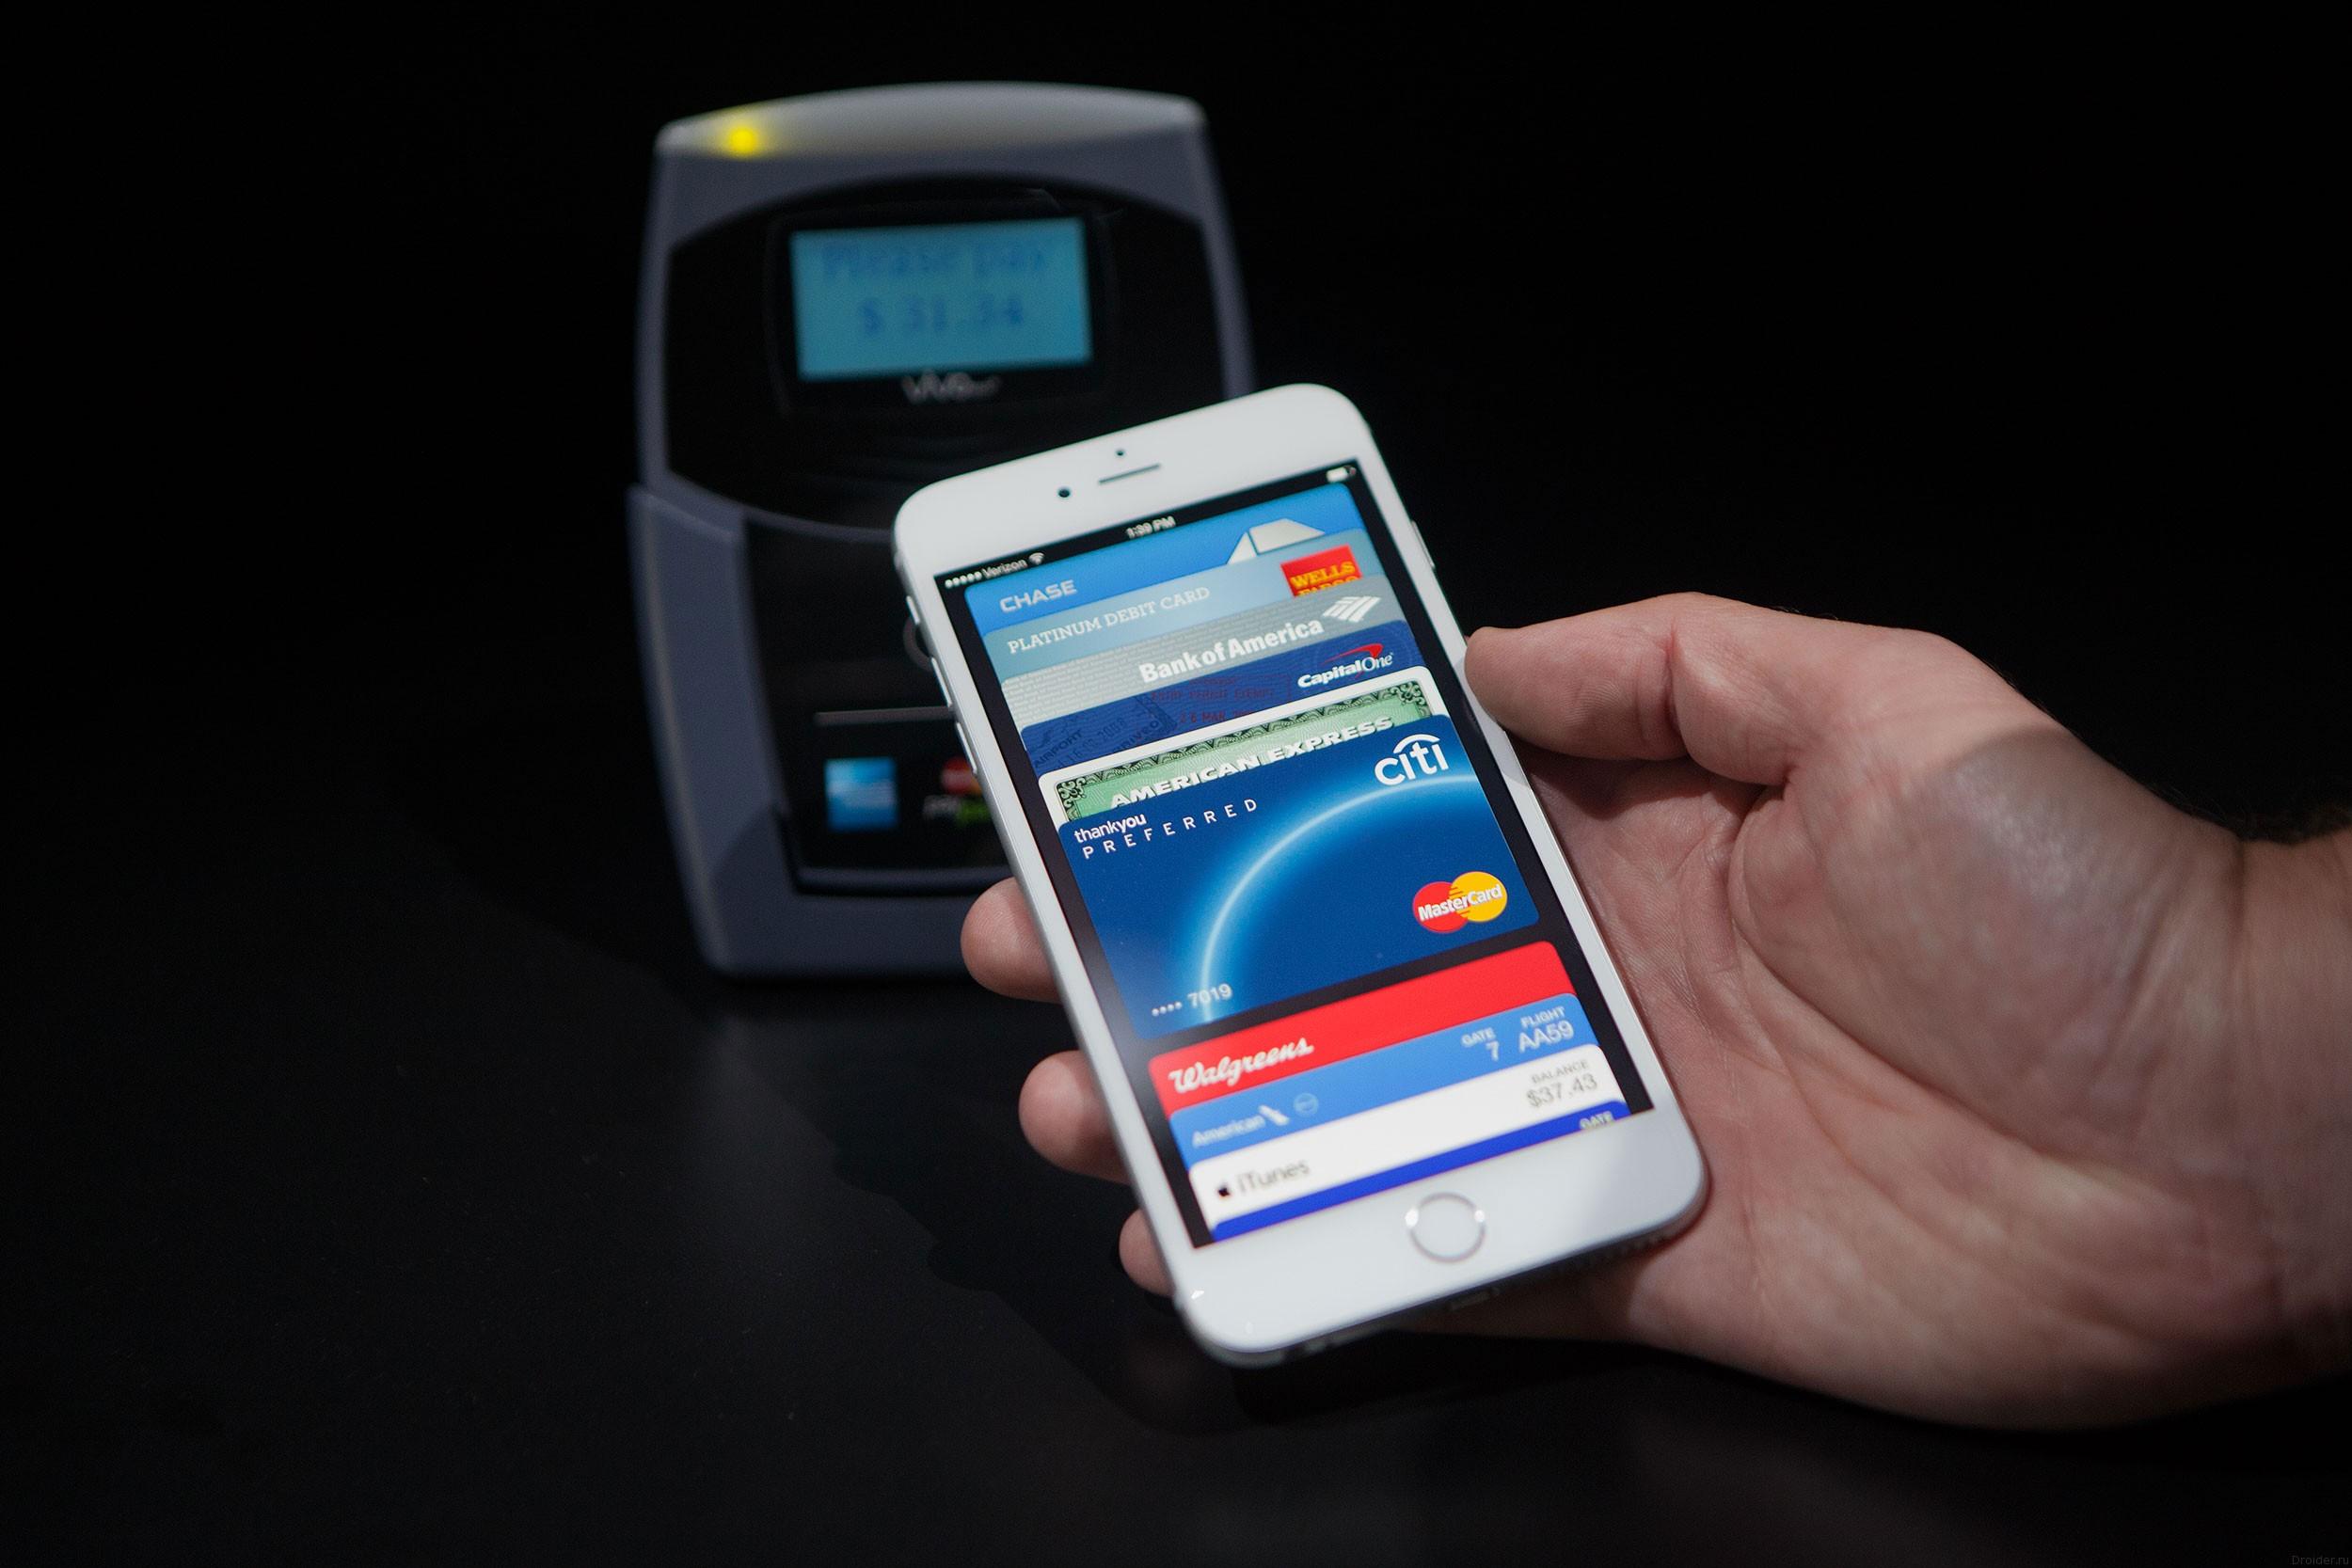 В начале 2015 года Yota запустит аналог Apple Pay